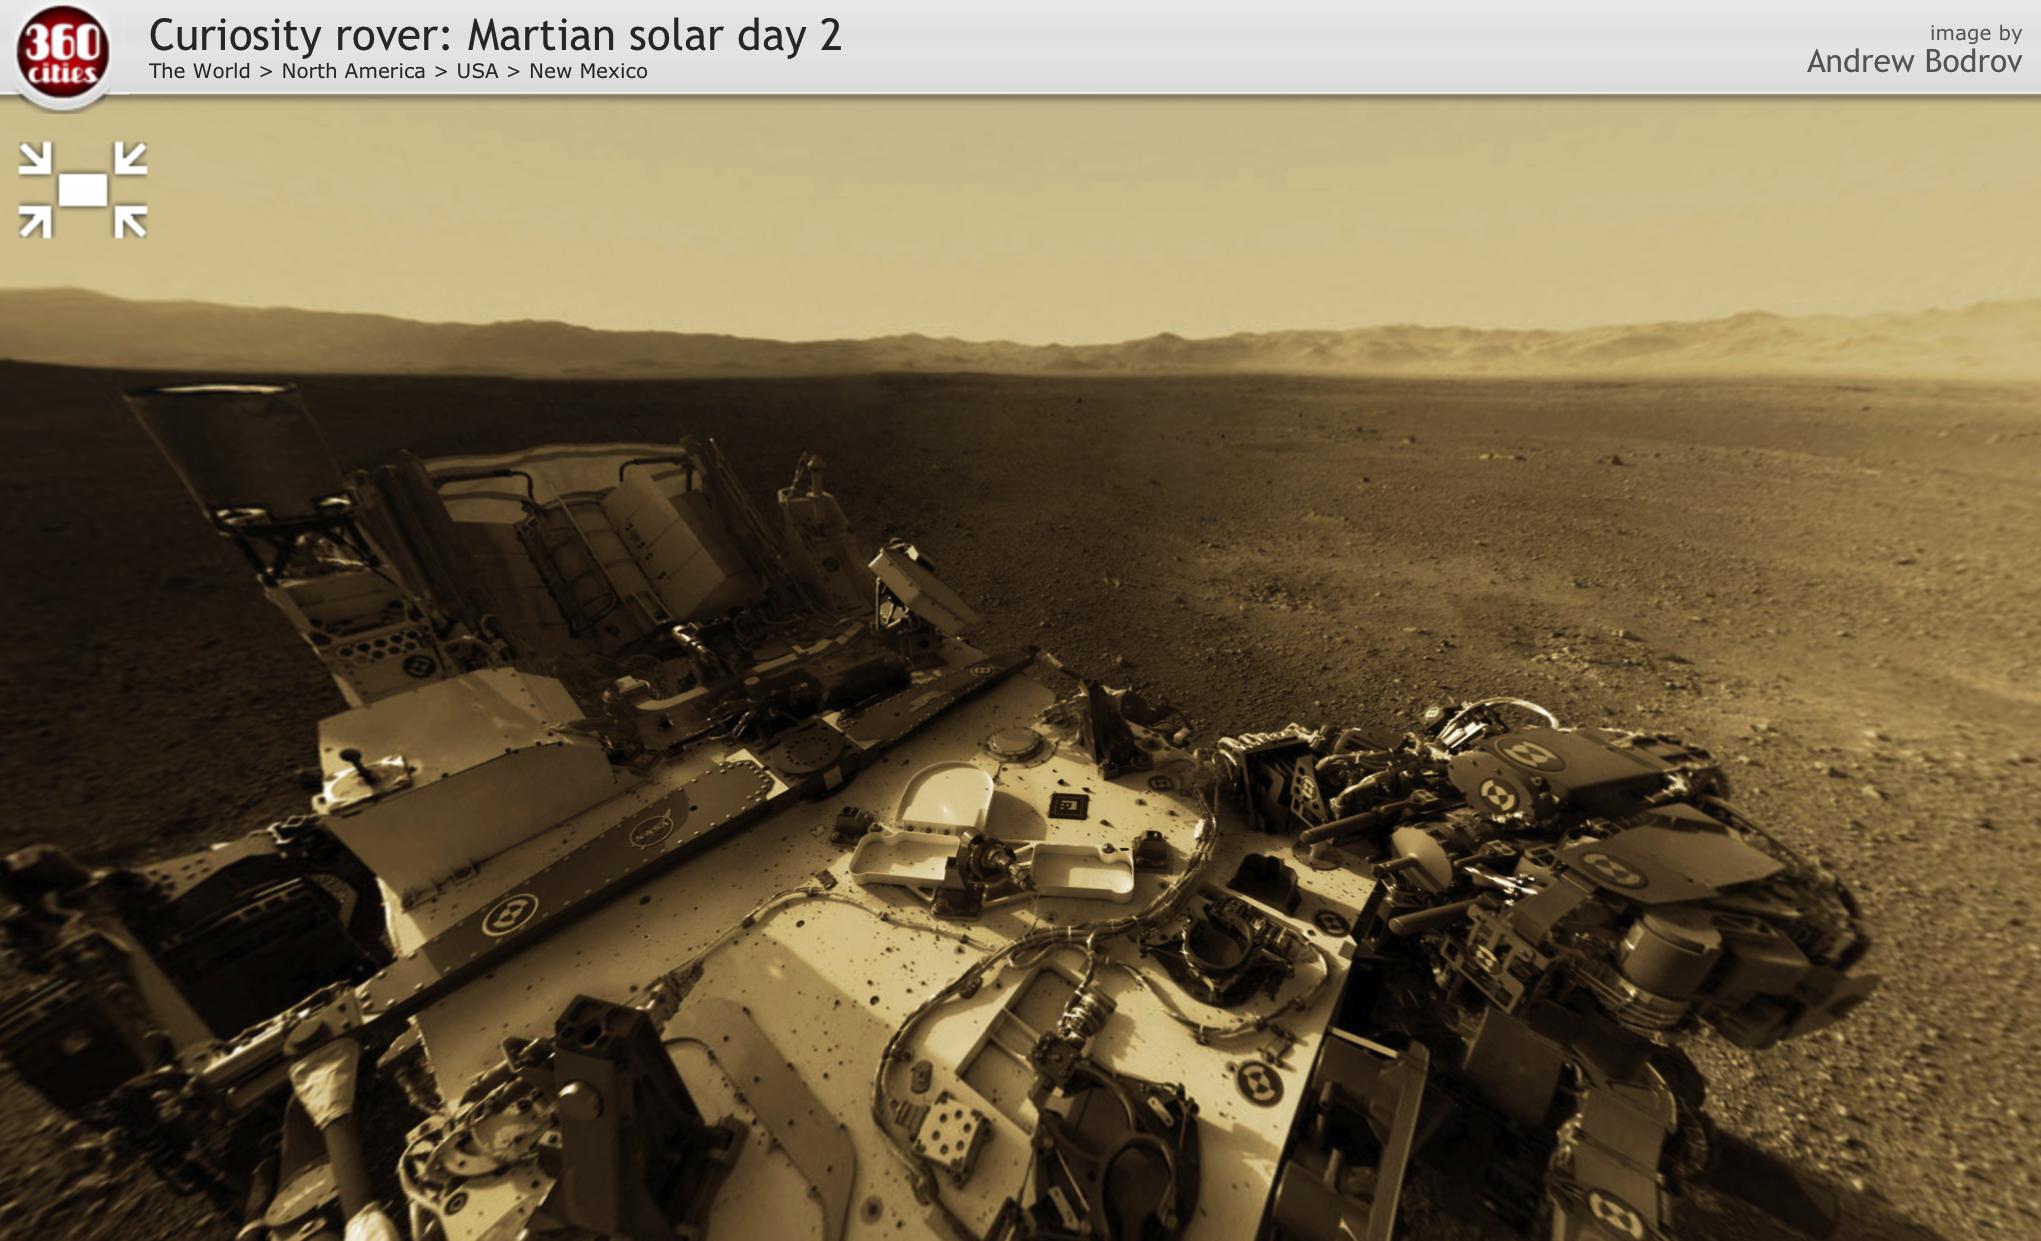 mars surface curiosity panorama - photo #34